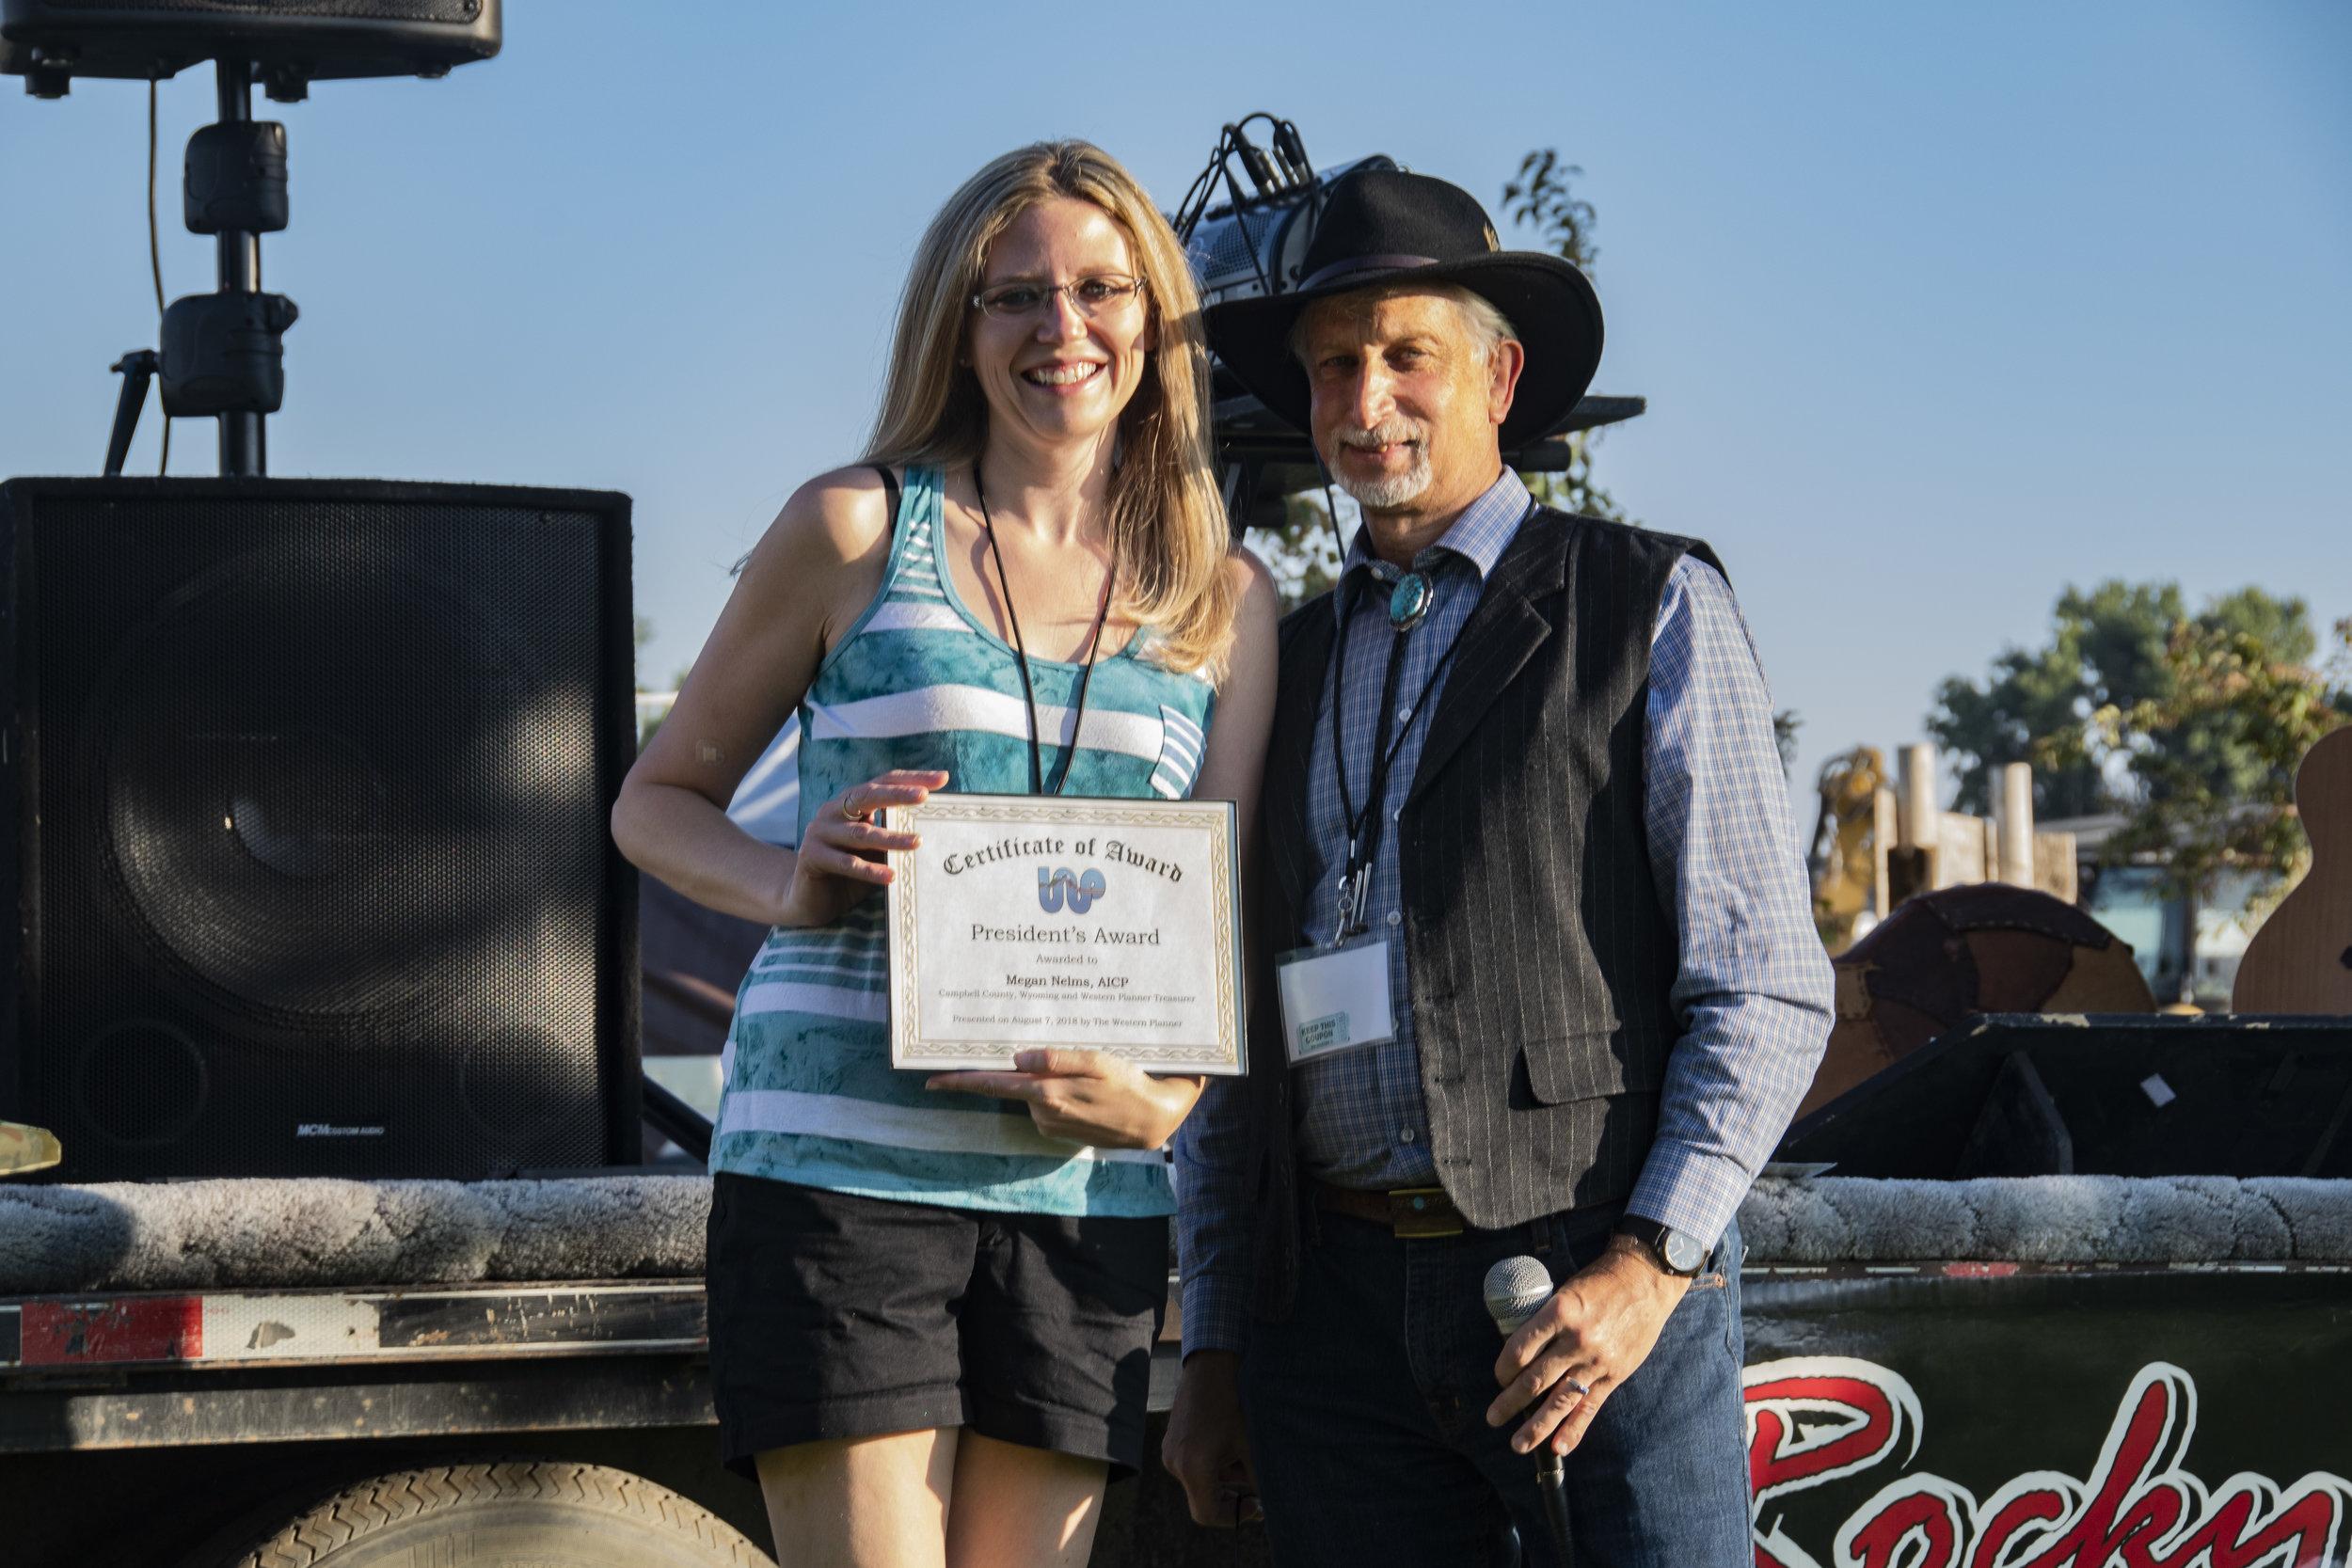 Megan Nelms, AICP receives President's Award from Dan Pava, FAICP.